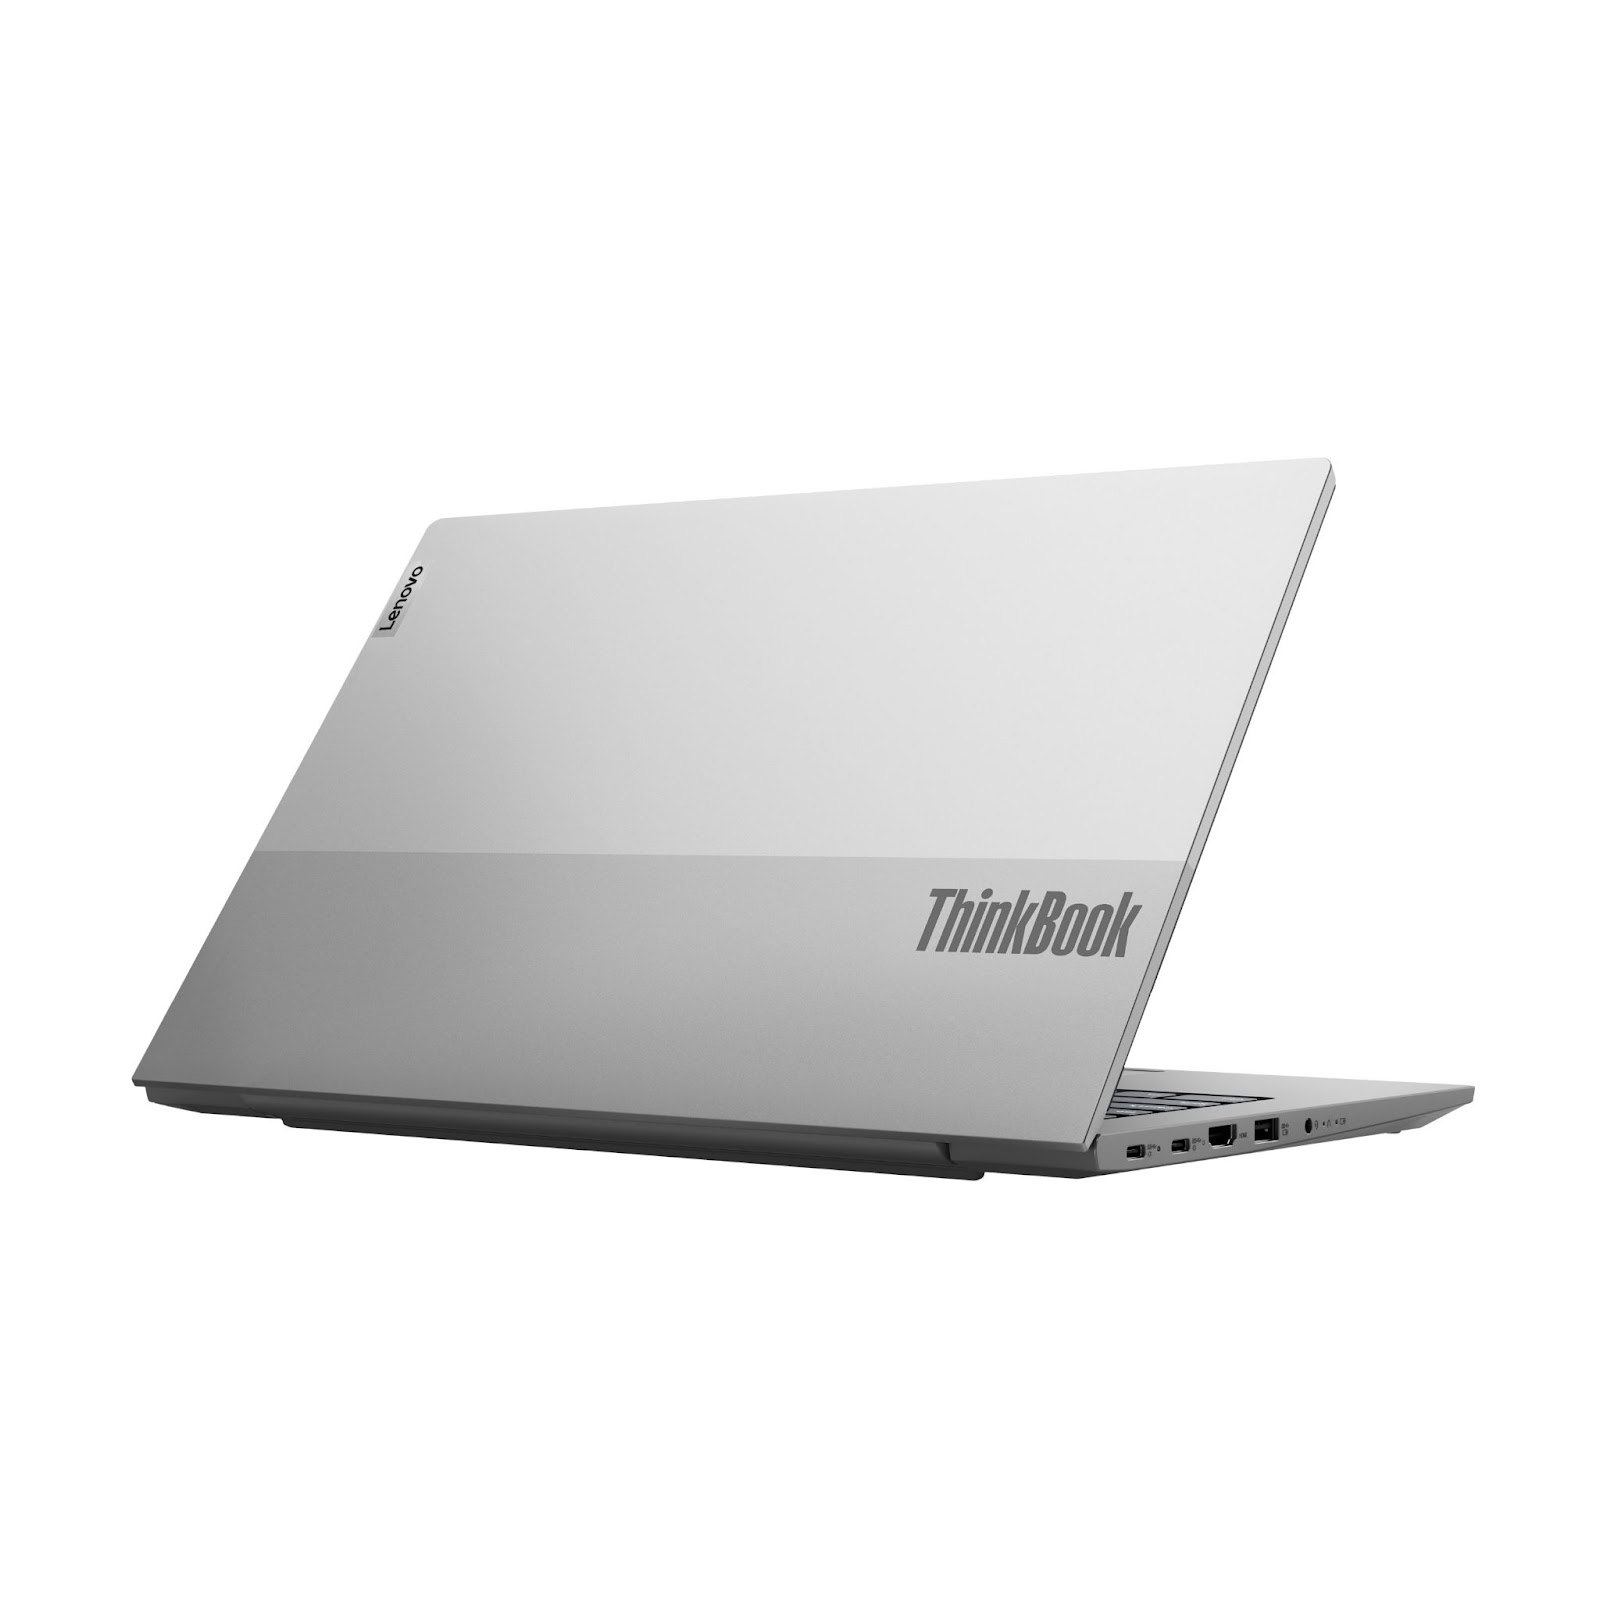 Фото 2. Ноутбук Lenovo ThinkBook 14 Gen 2 ITL Mineral Grey (20VD0044RU)